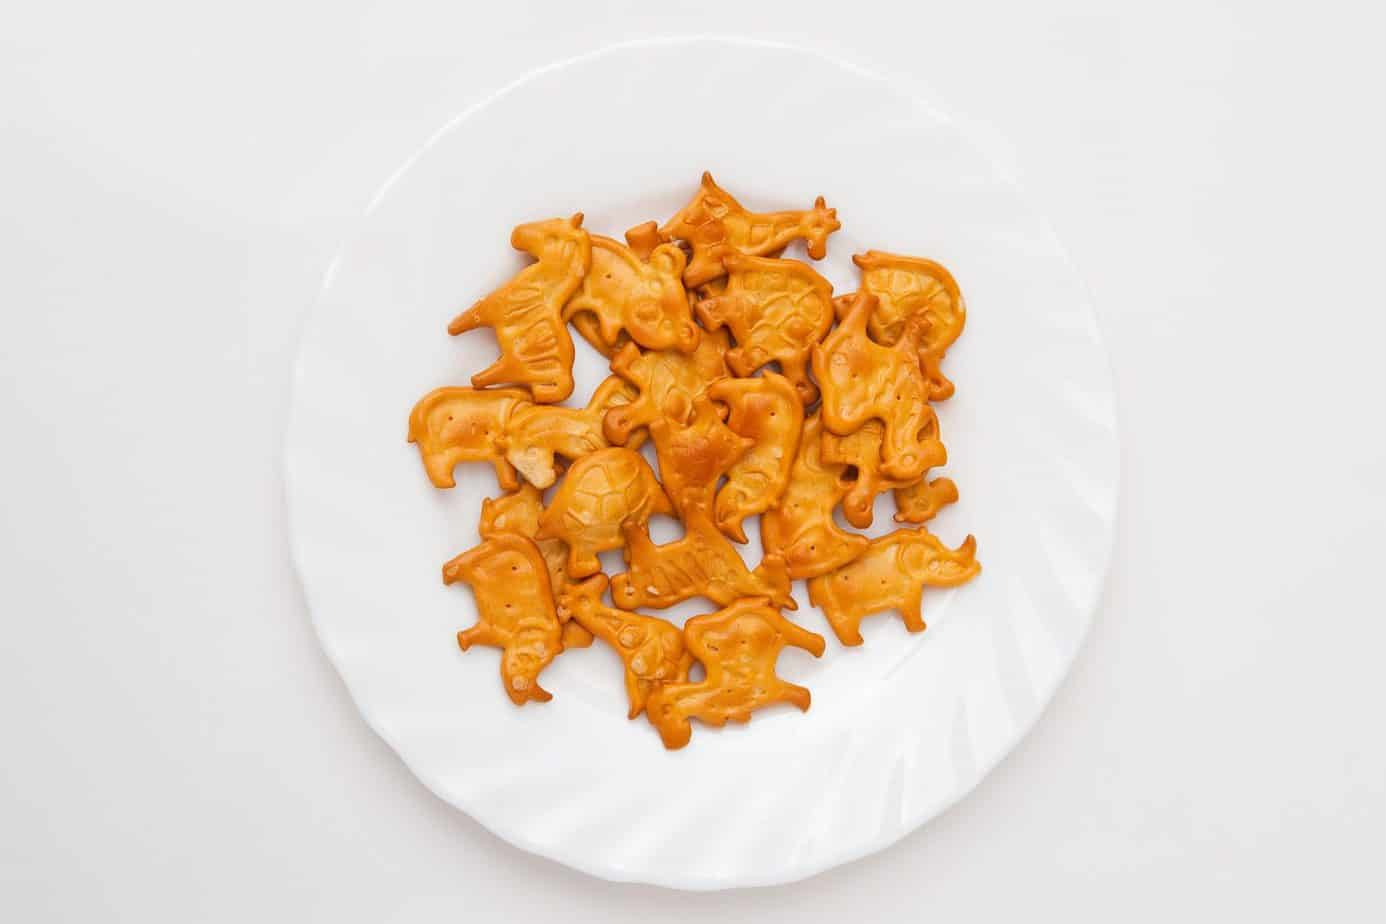 Are animal crackers vegan?